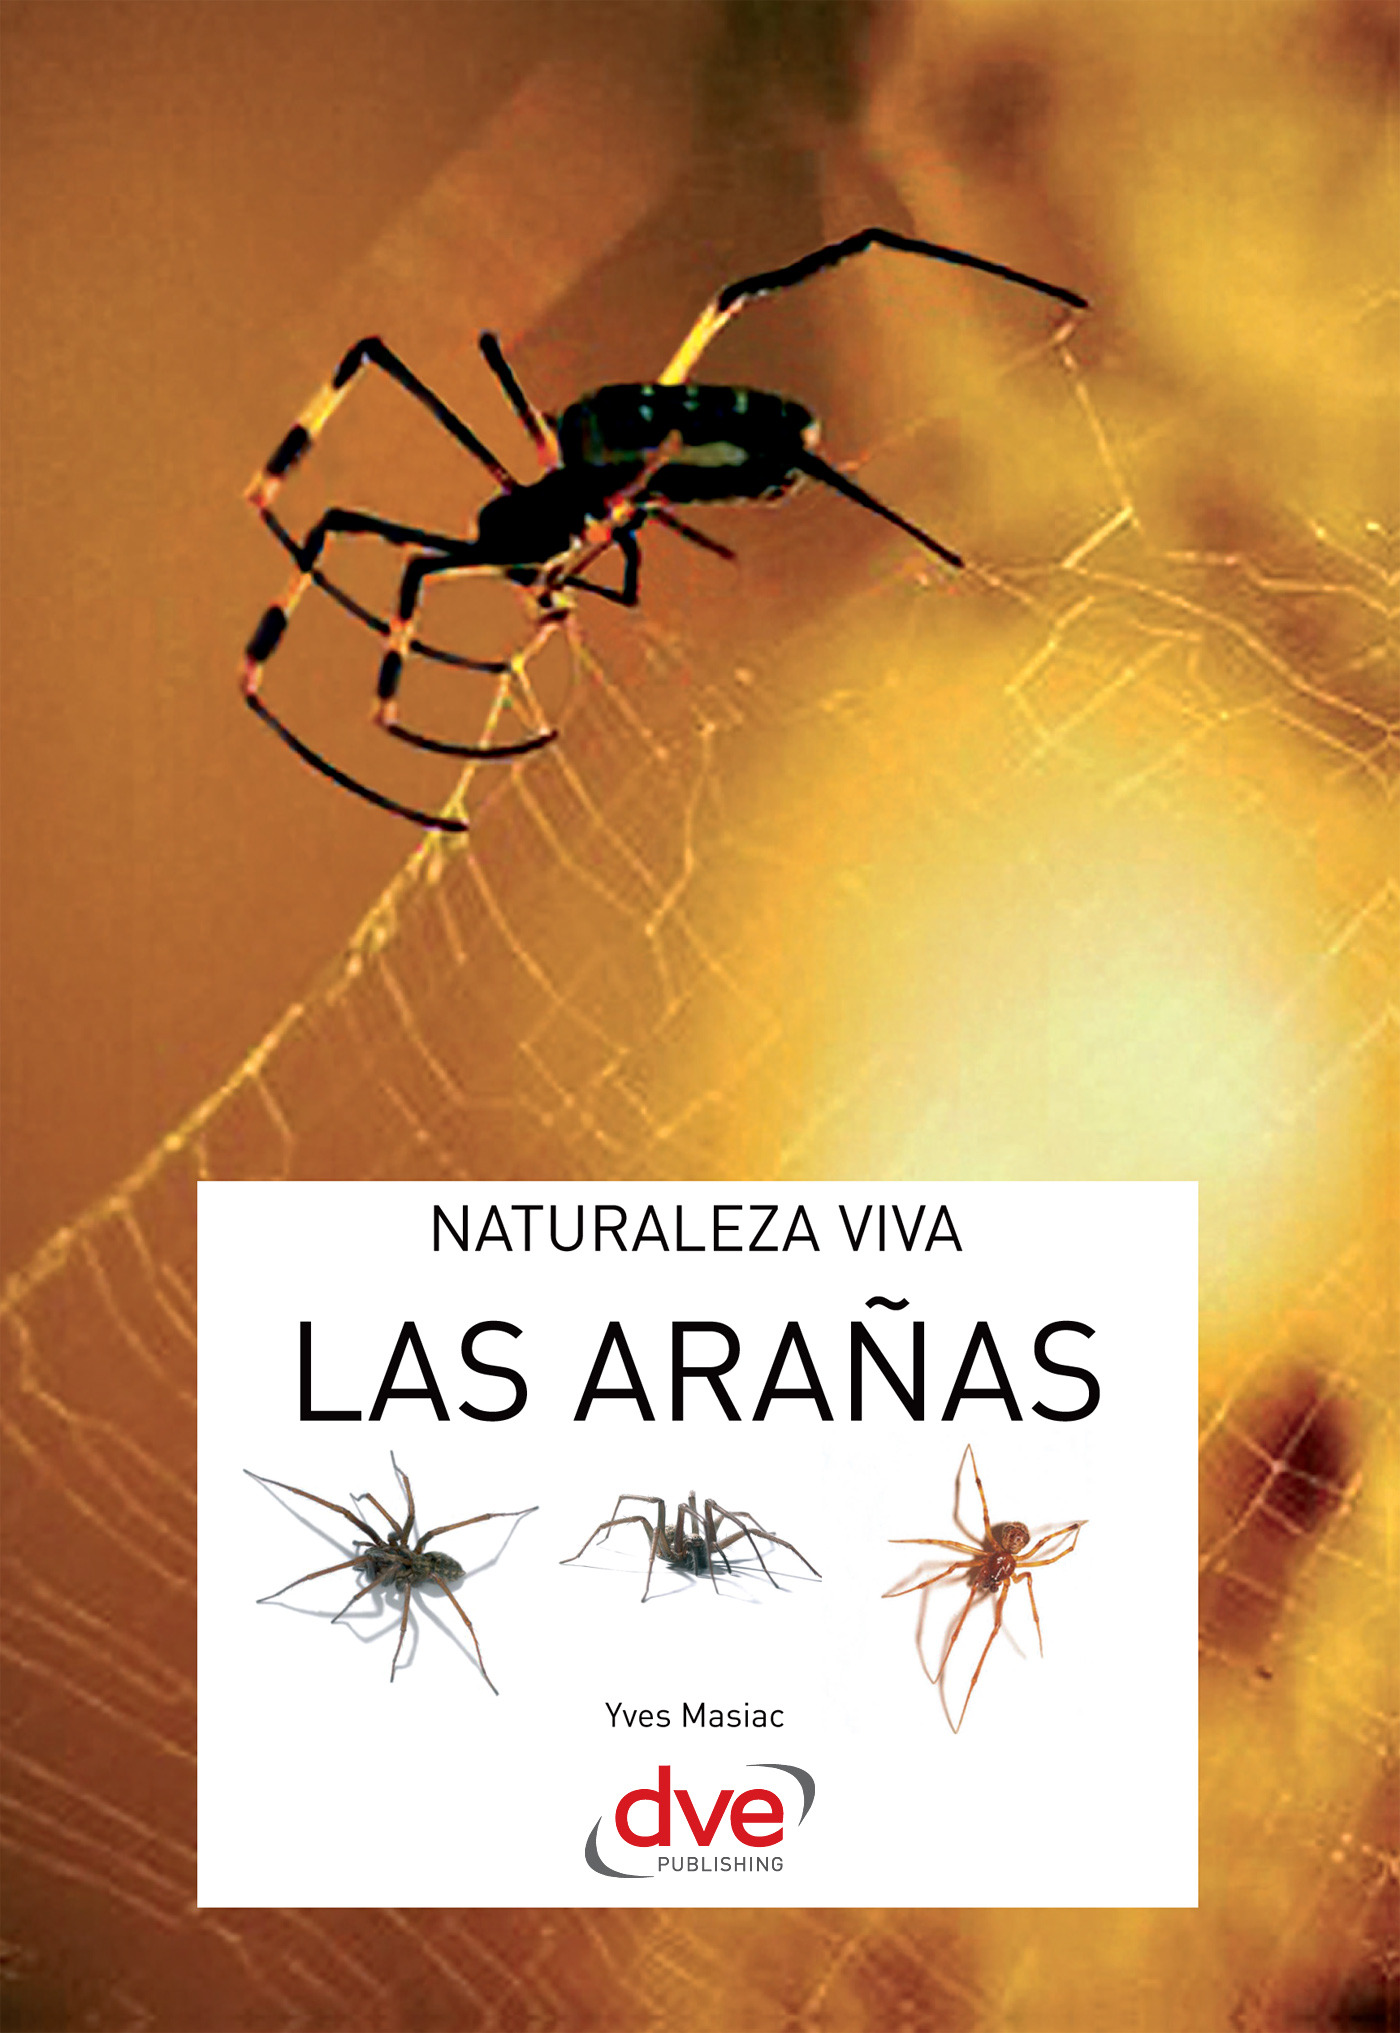 Masiac, Yves - Las arañas, ebook